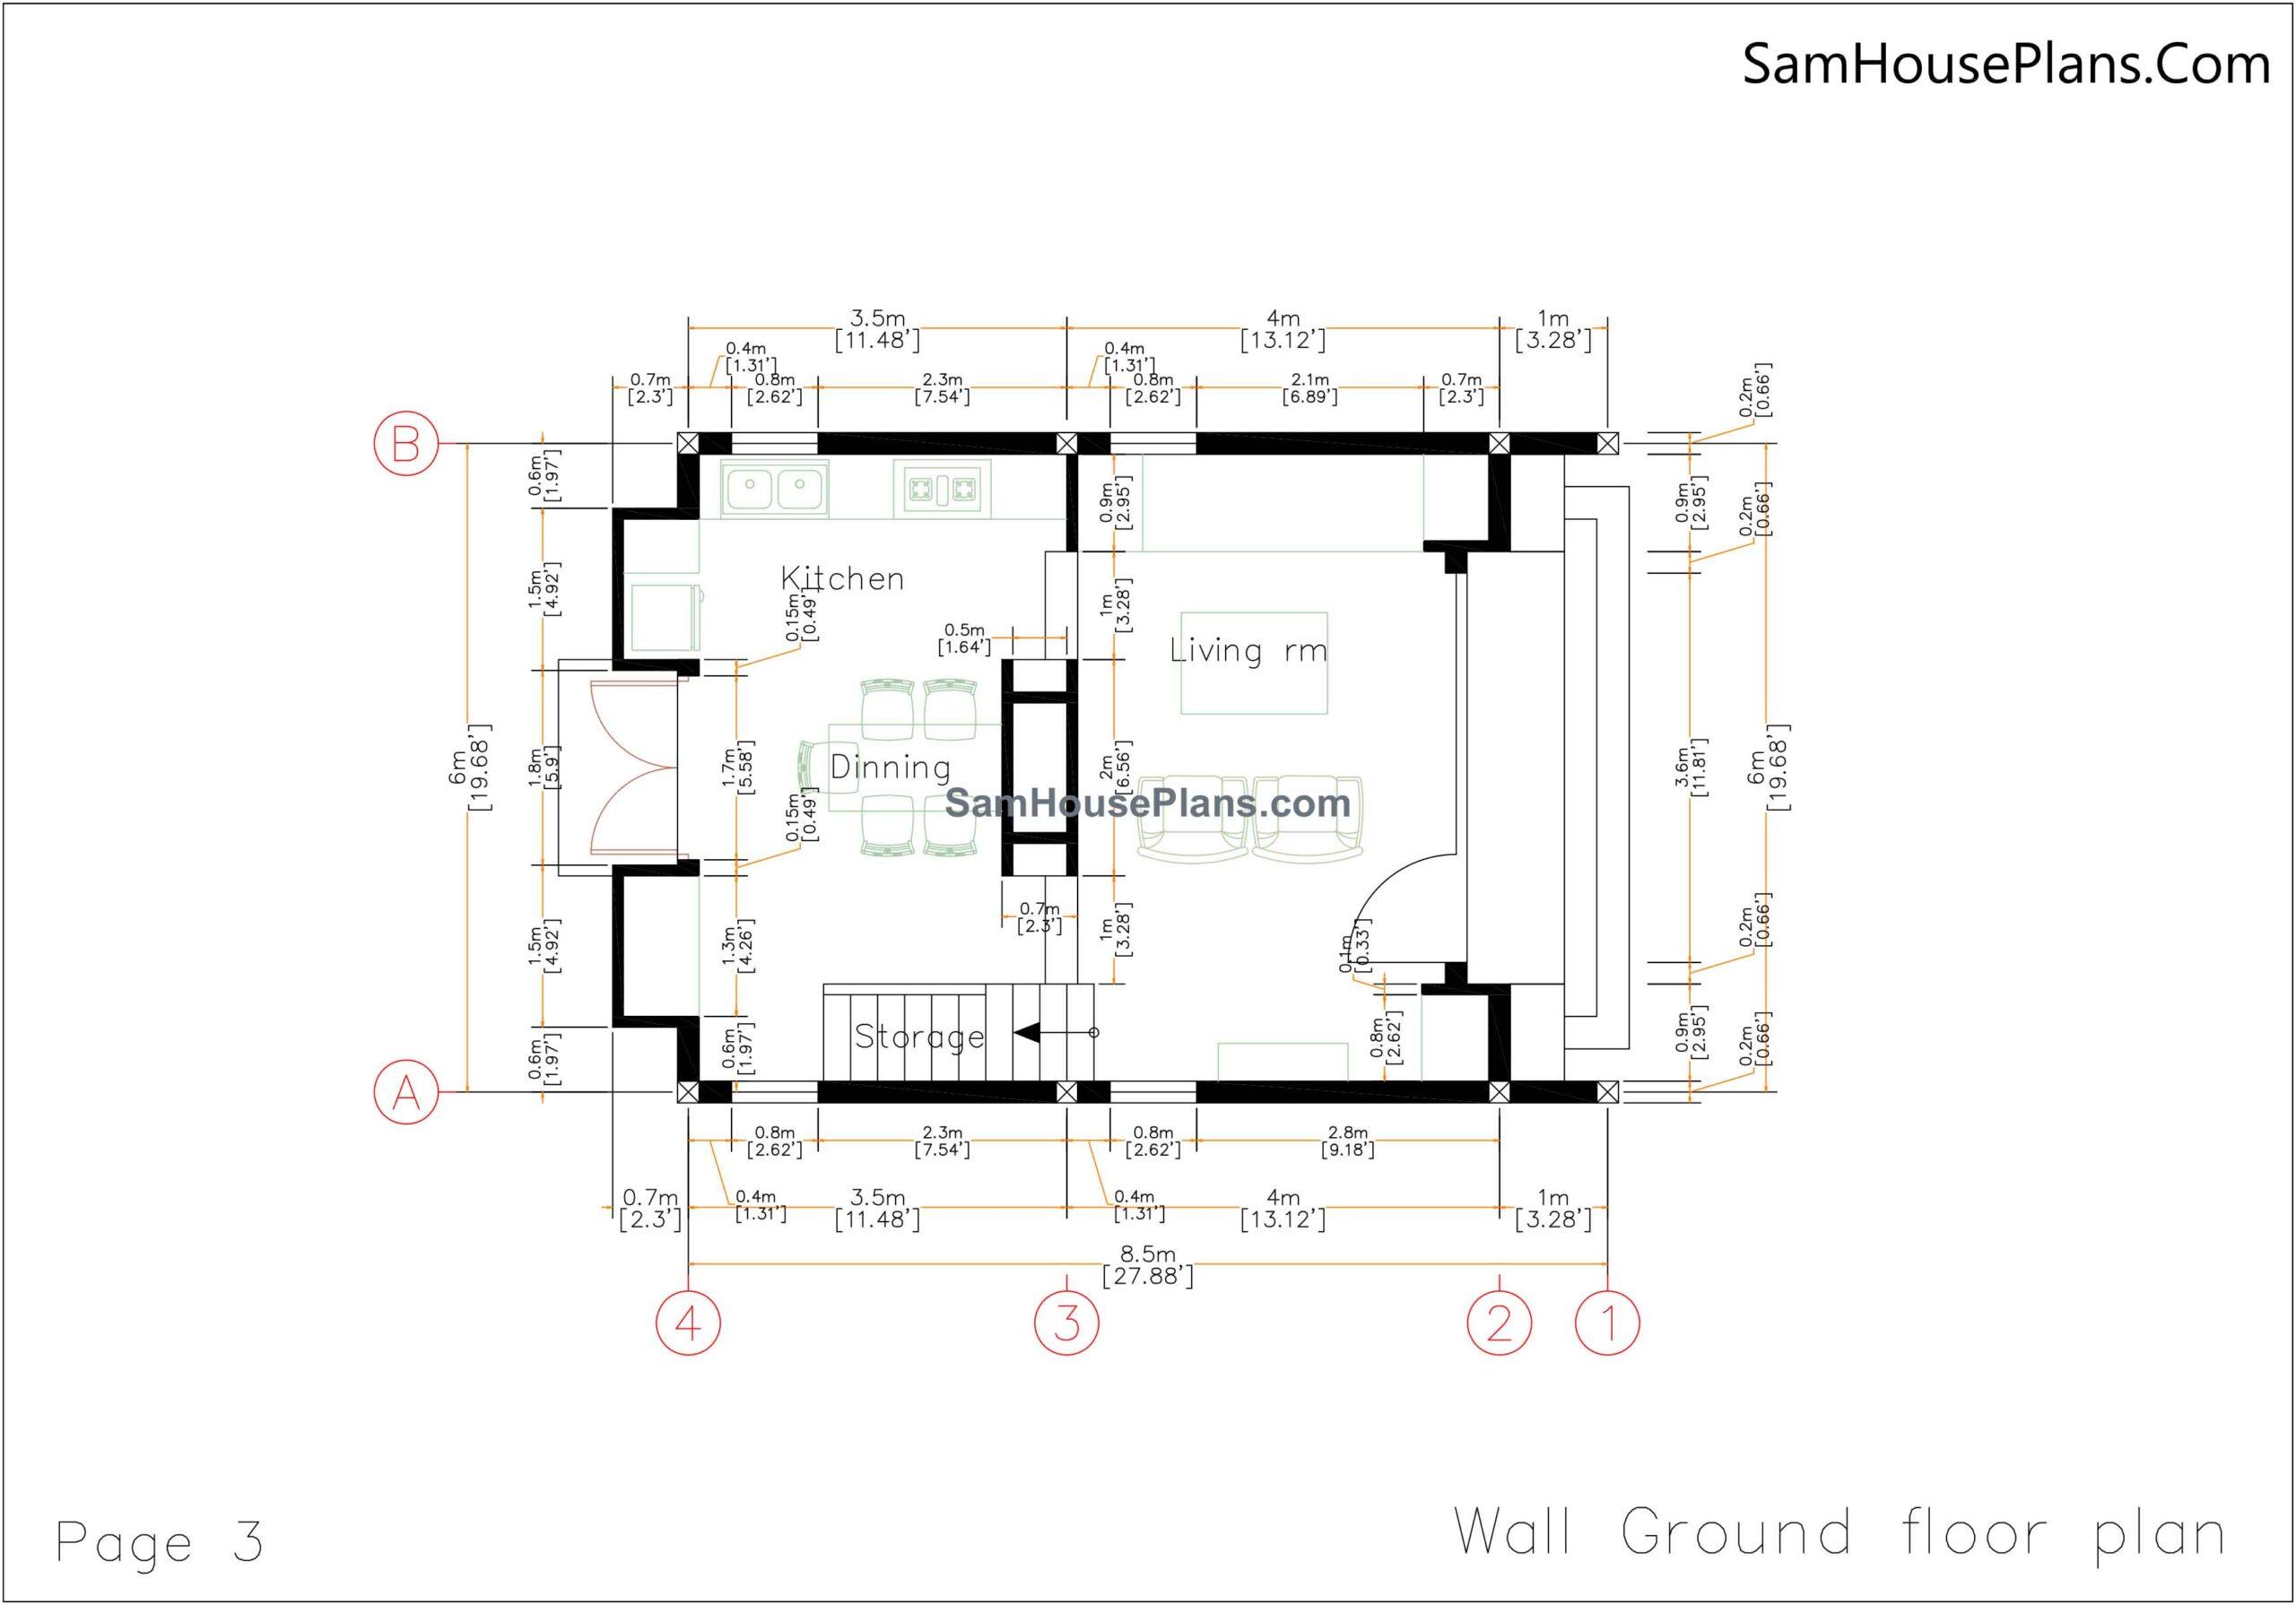 03 wall ground Floor Plan 20x30 Small House Plan 6x8.5m